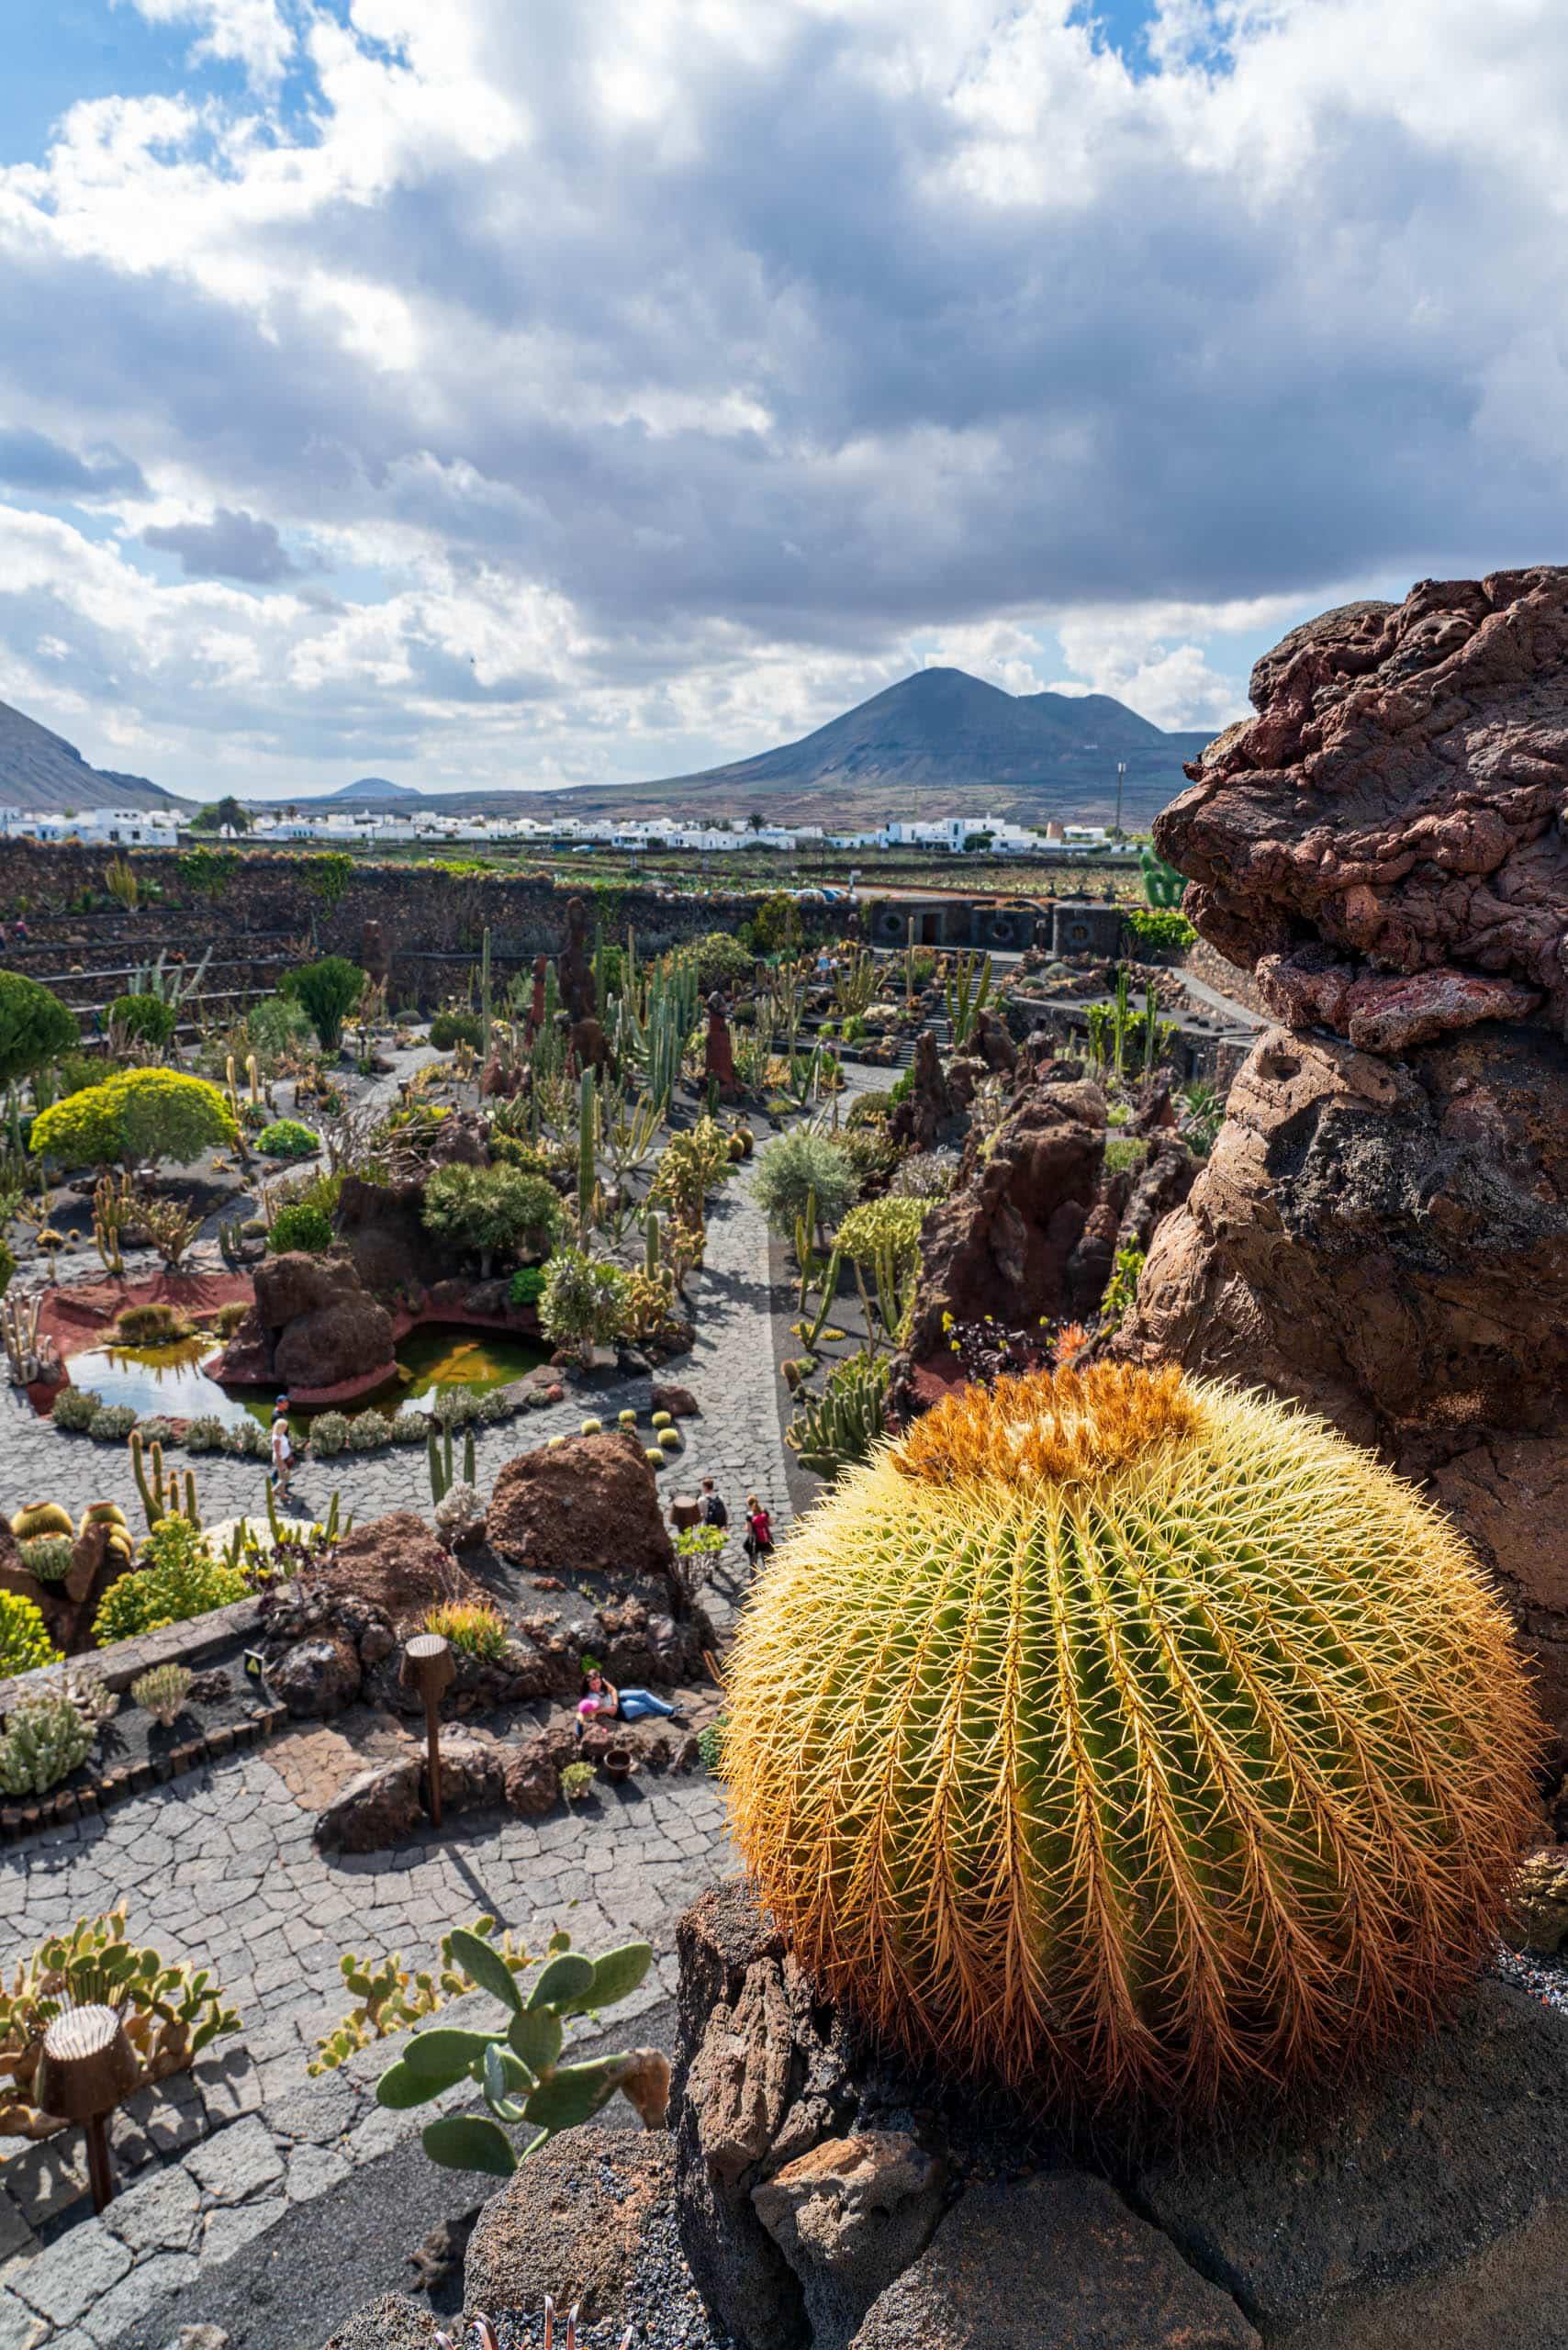 Cactus Garden 6 | f/13 1/80sec ISO-100 24mm  | ILCE-7RM3 | 2019-01-27 14:09:09